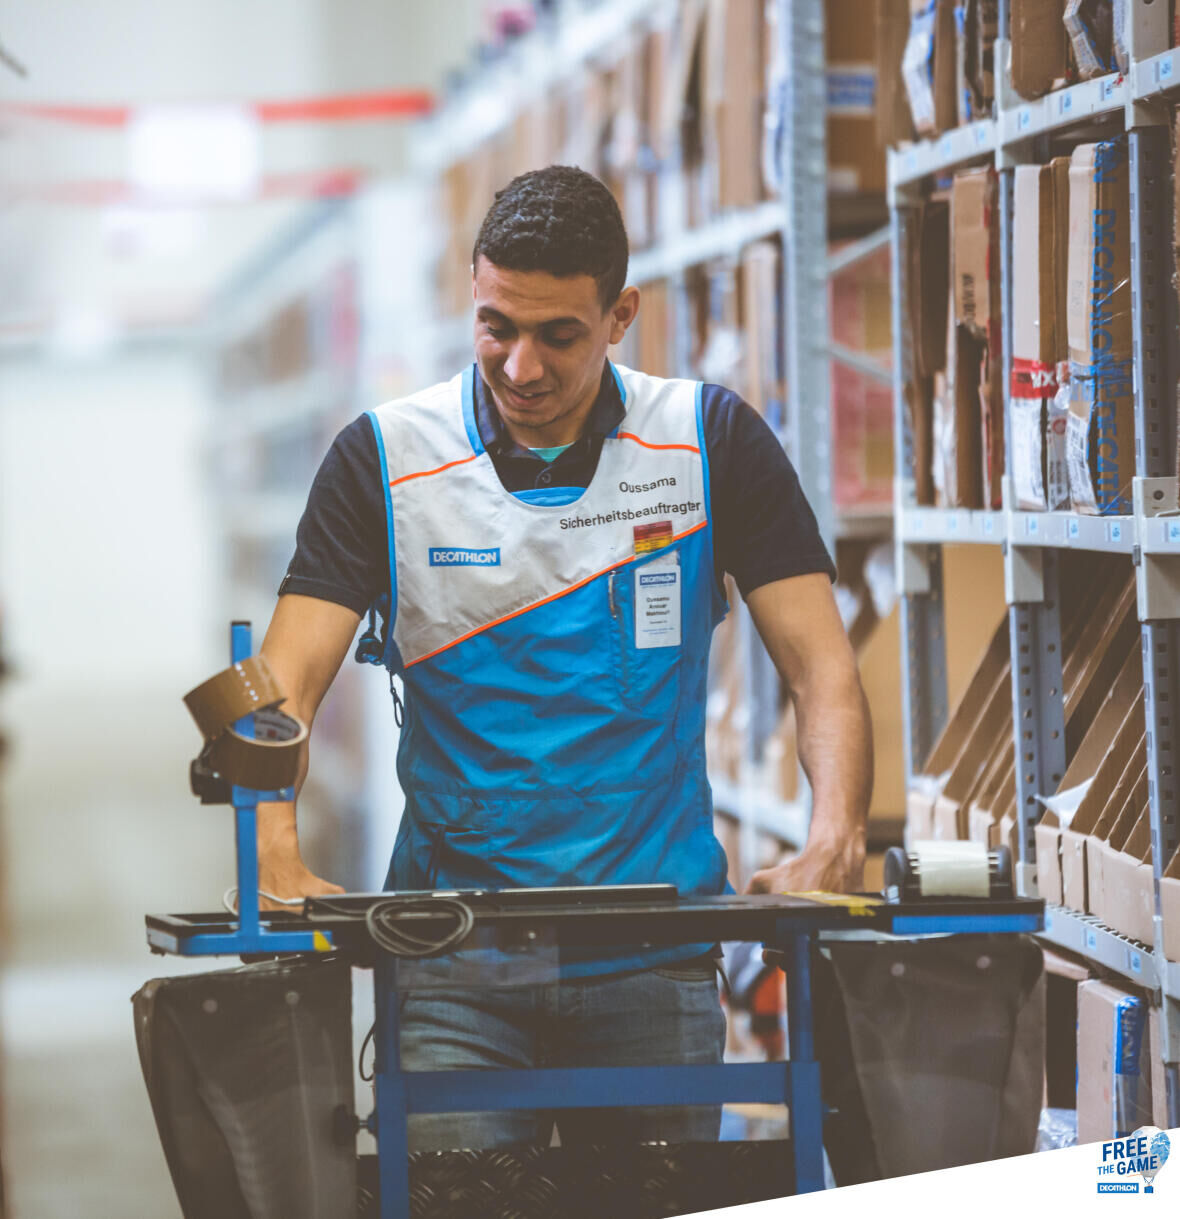 decathlon logistics product transport